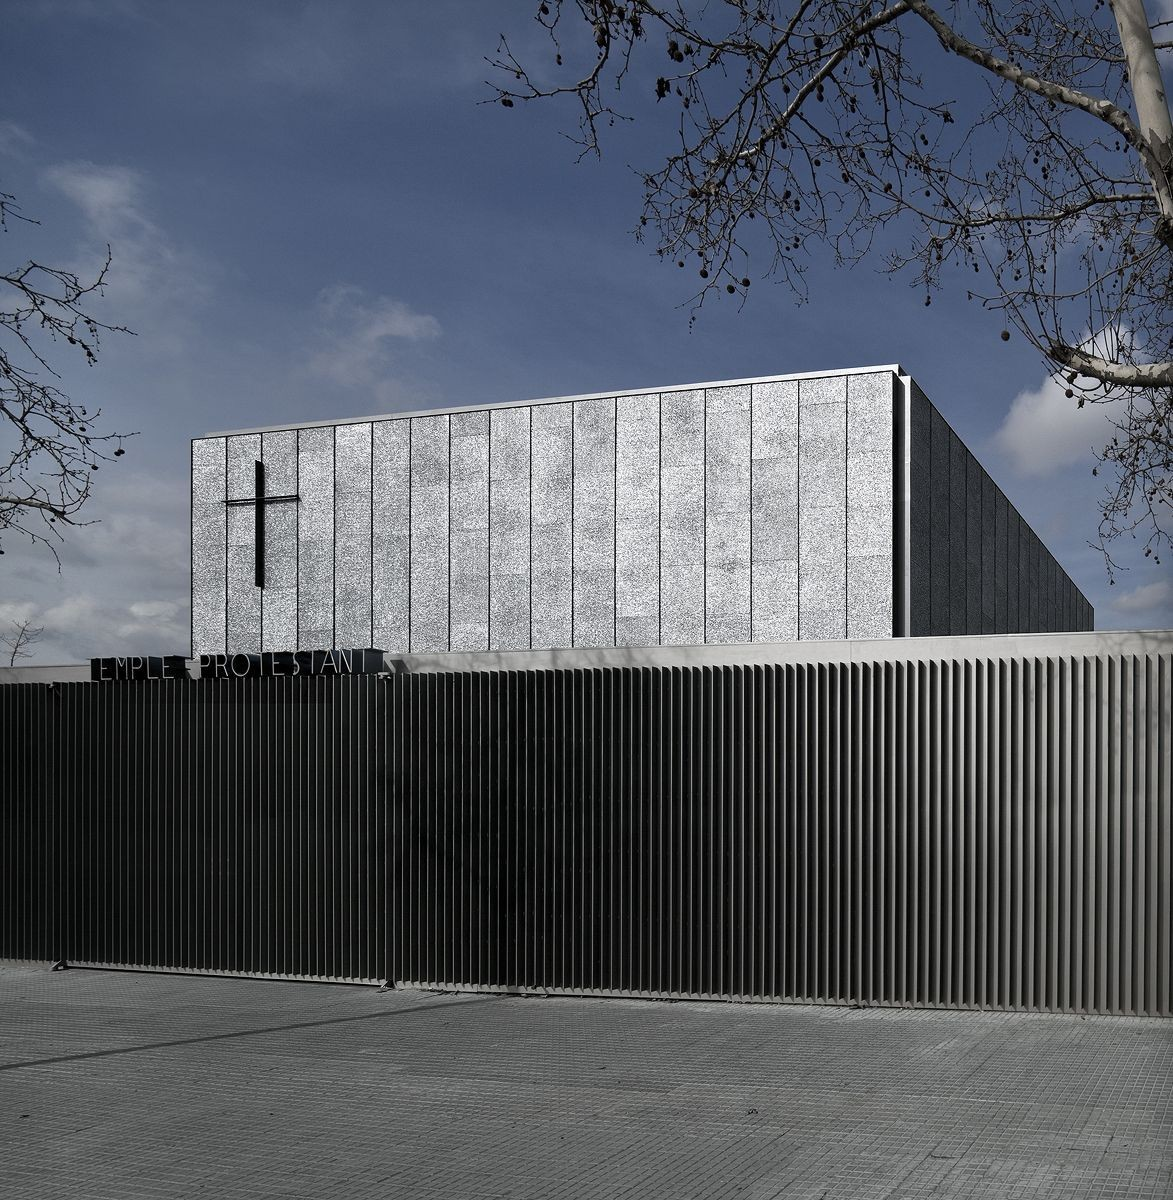 Primera Semana de Arquitectura Evangélica / Fondecyt, Chile, Templo Evangelico en Terrassa / OAB. Image © Alejo Bagué